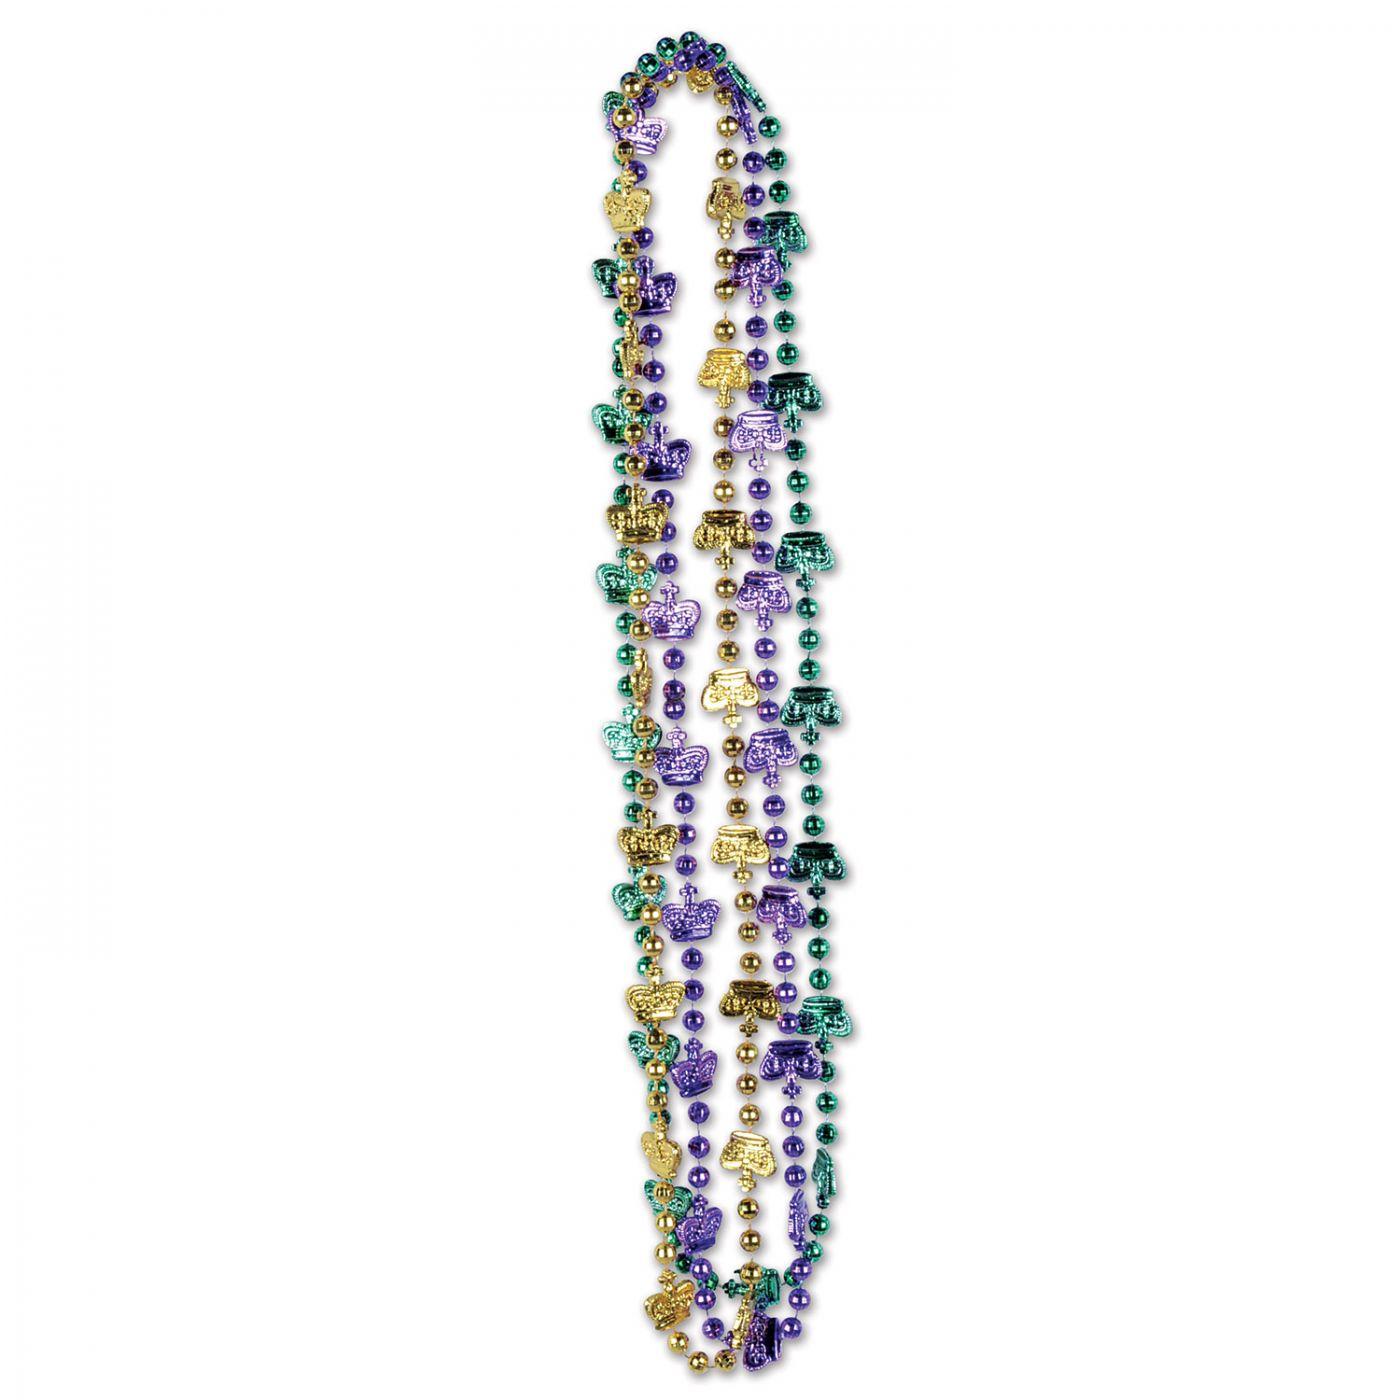 Mardi Gras Crown Beads image